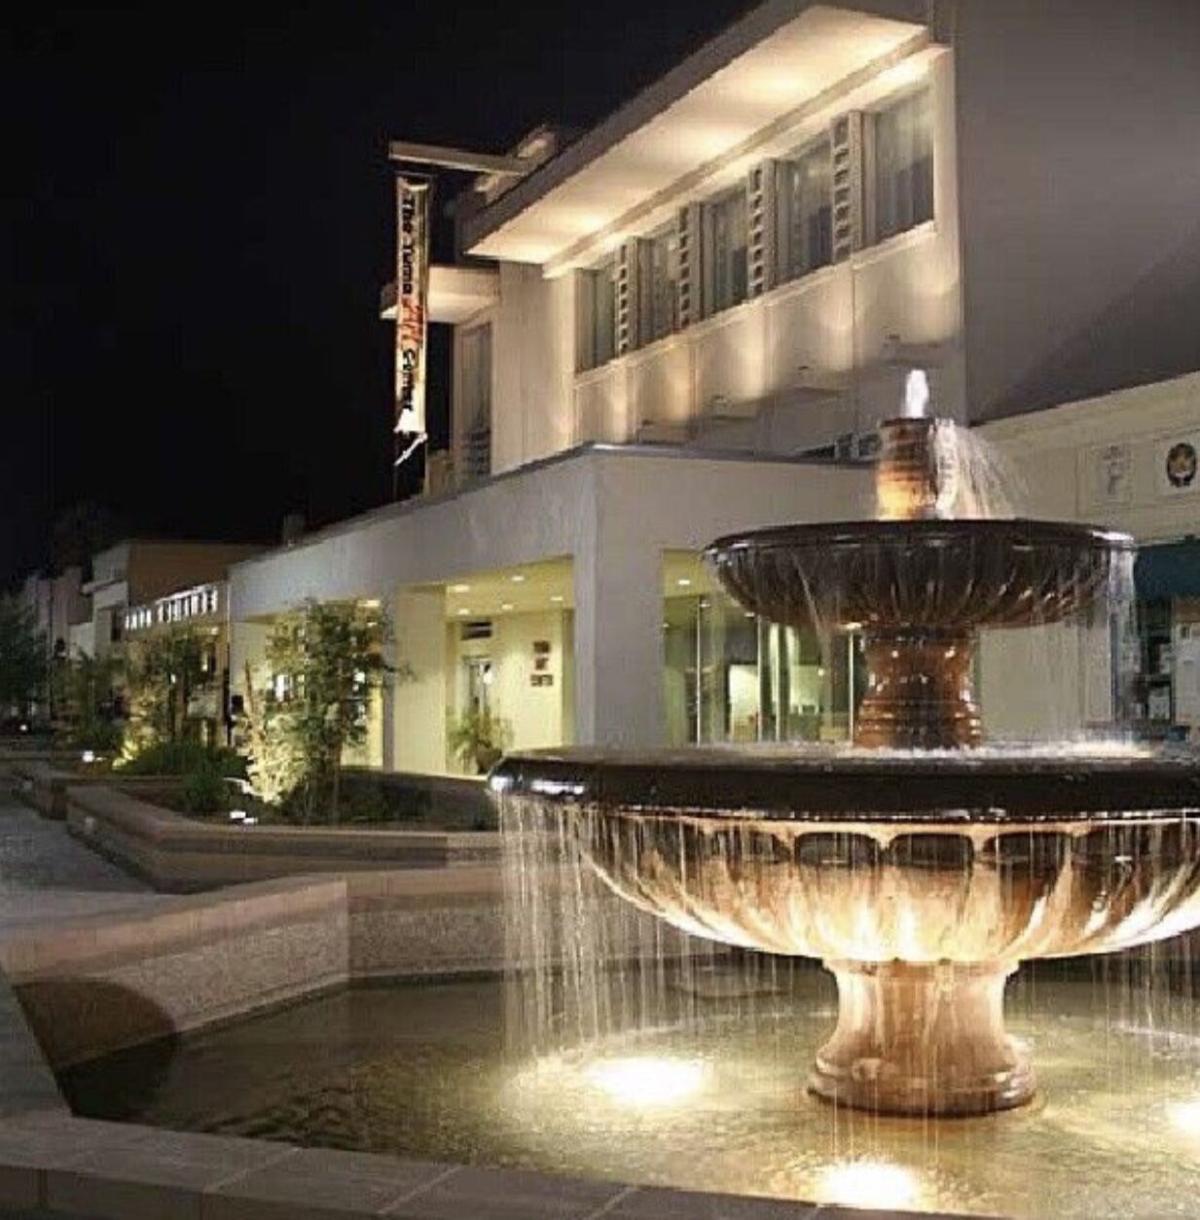 Cactus fountain to replace iconic downtown landmark: Original fountain